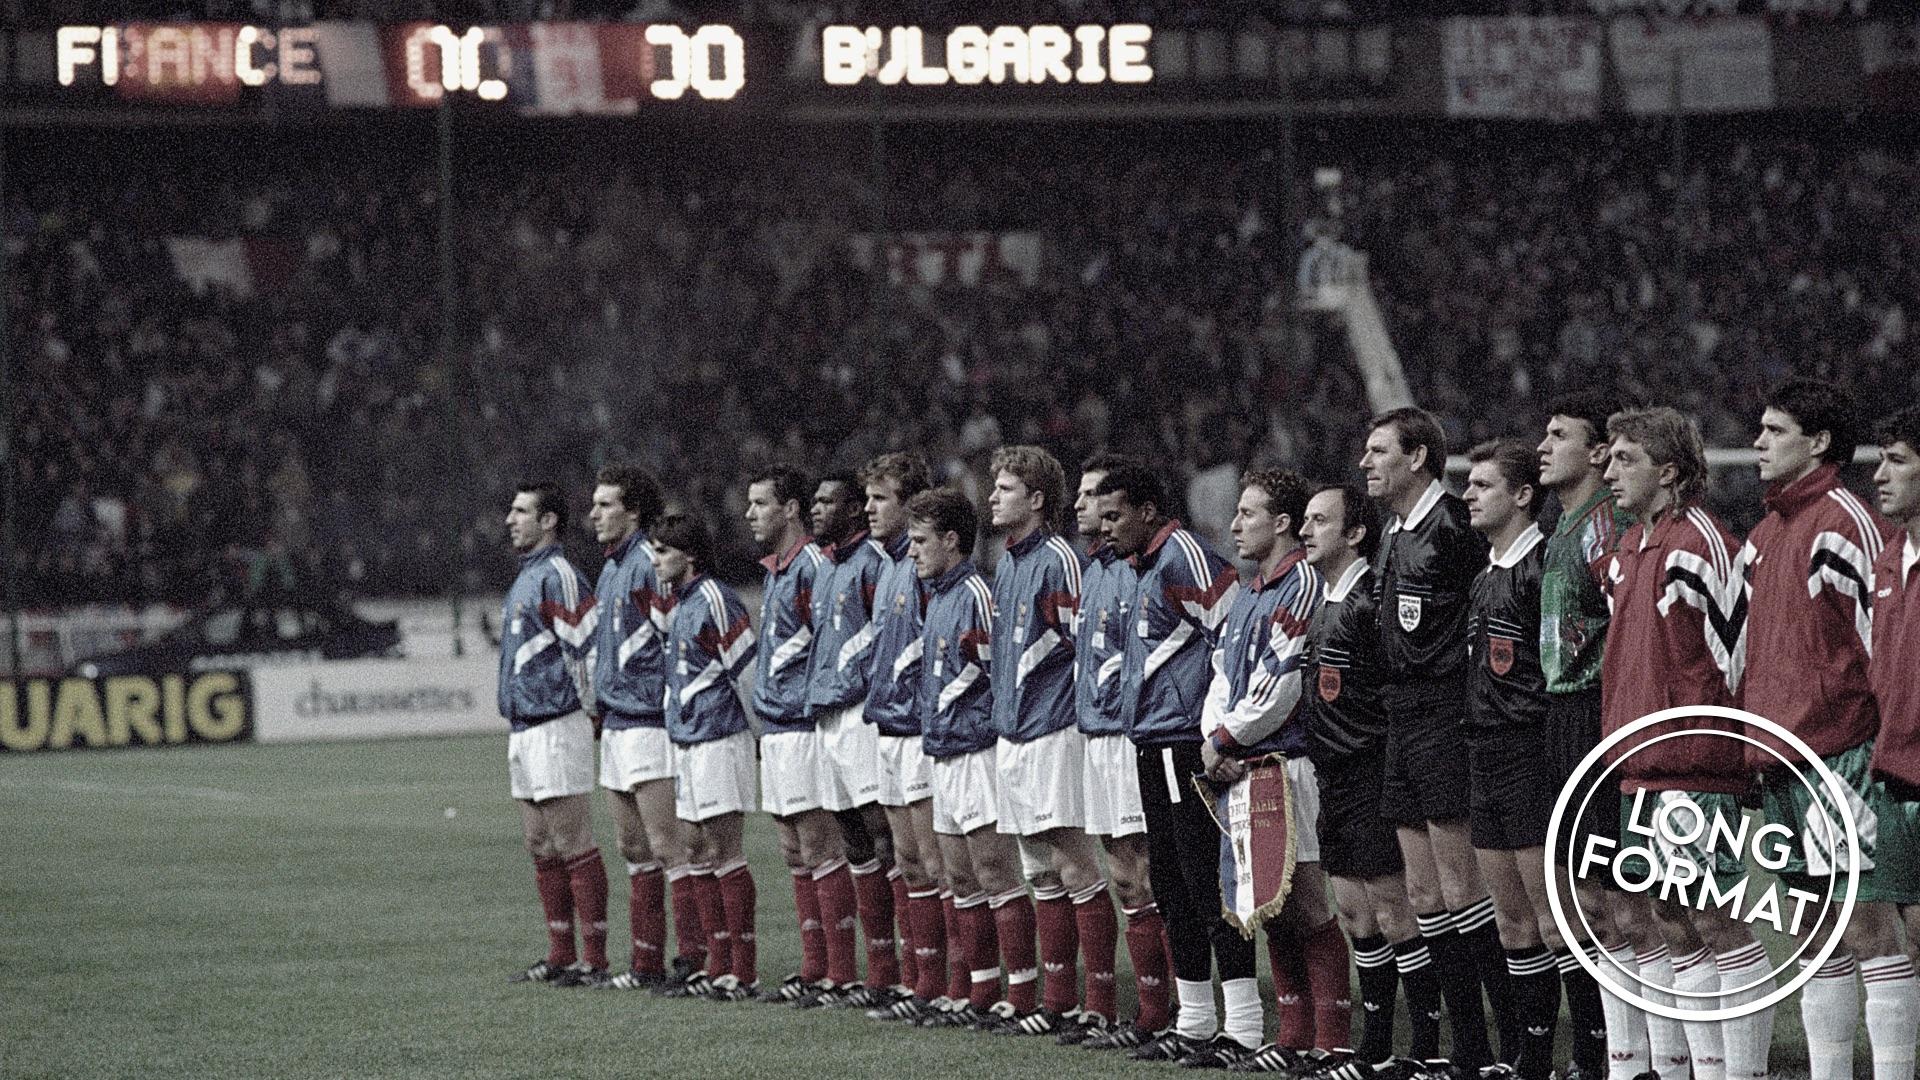 Football - Equipe de France - France-Bulgarie 93 : le cauchemar